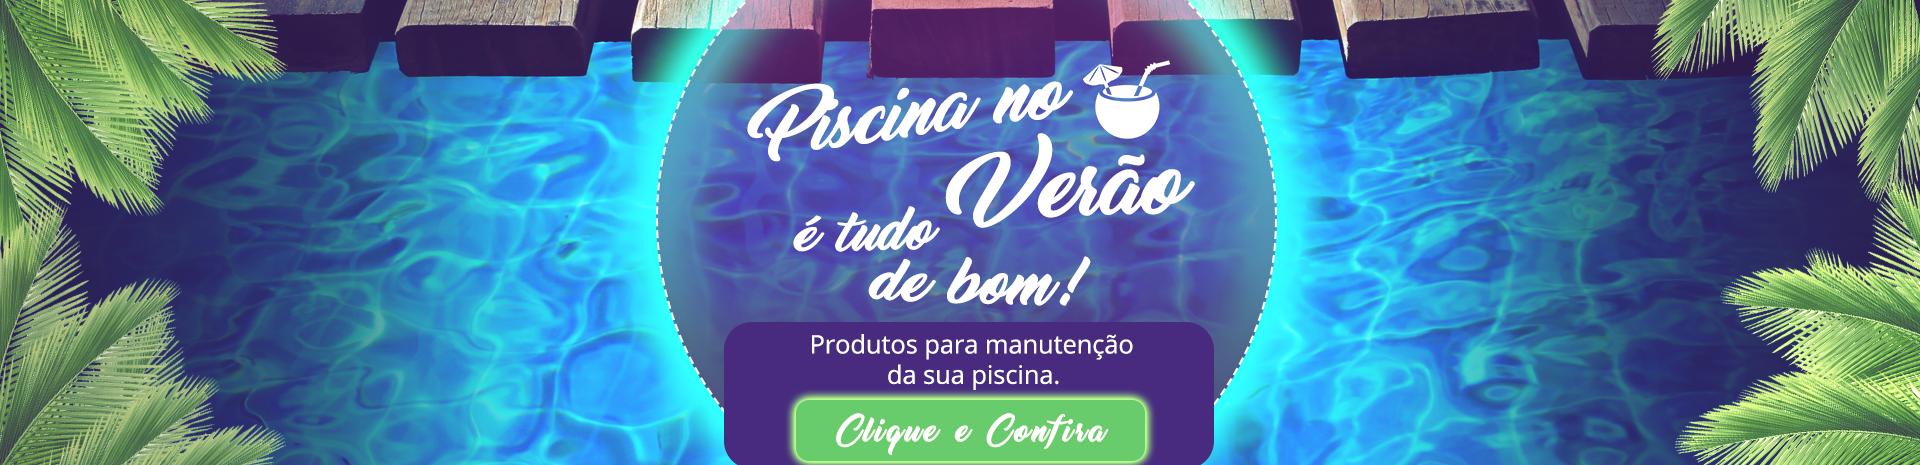 Banner 1 Piscina